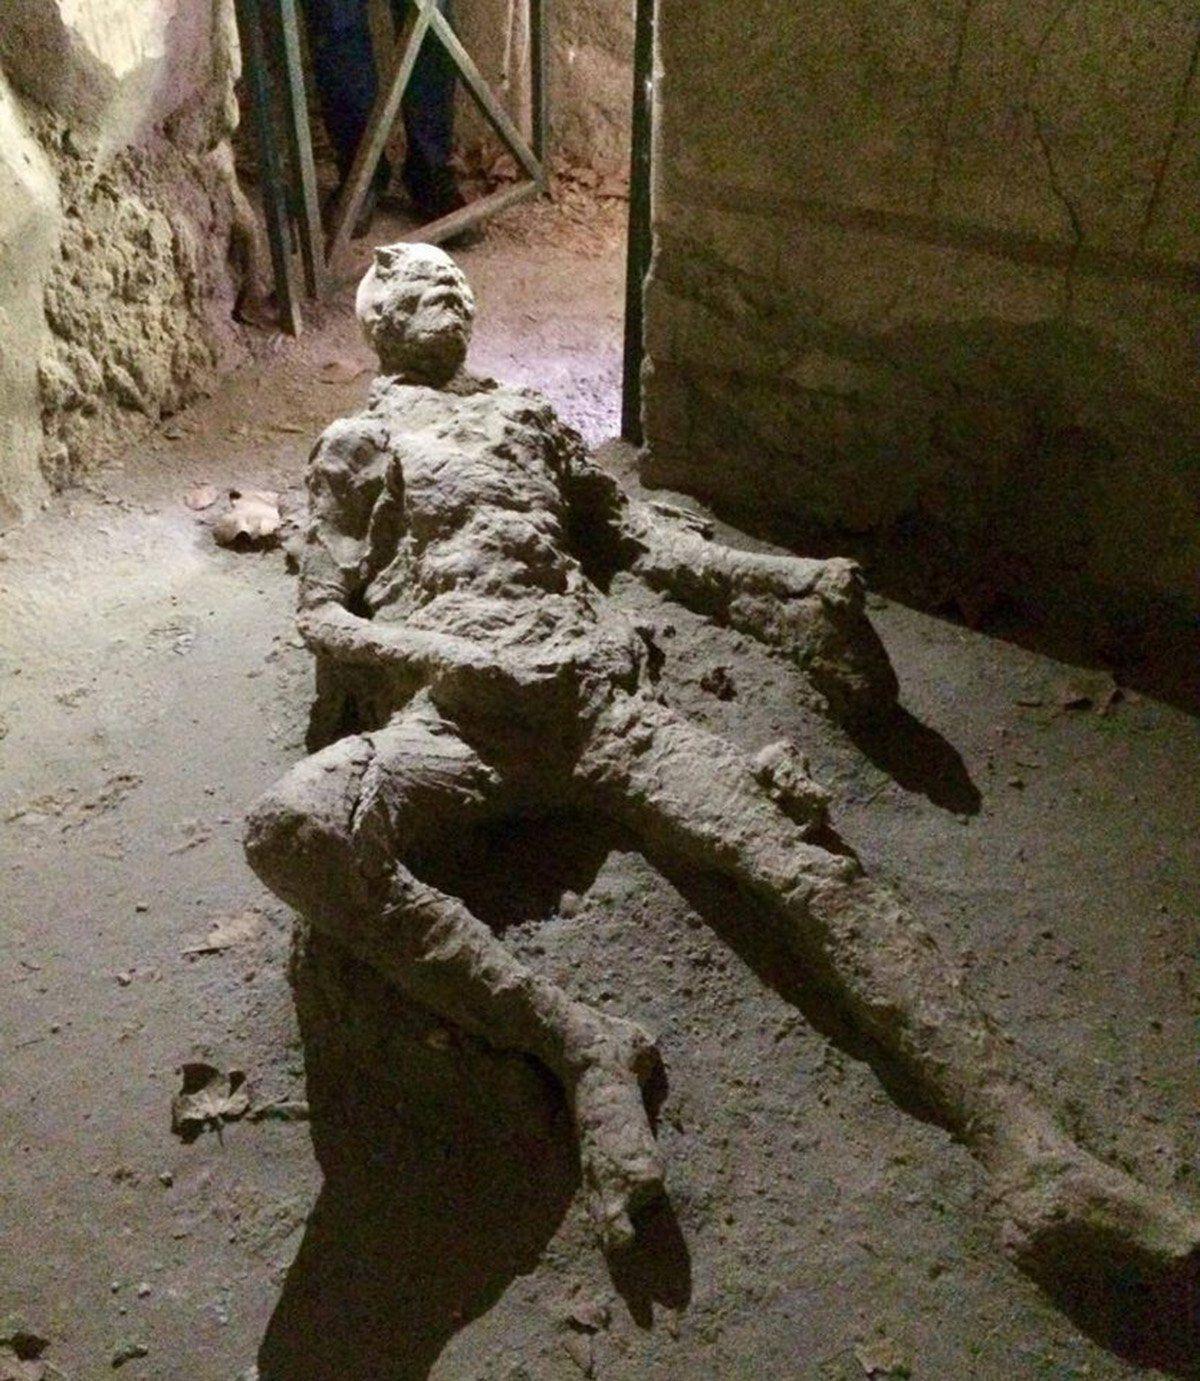 Much like the Masturbating Man of Pompeii, 79AD